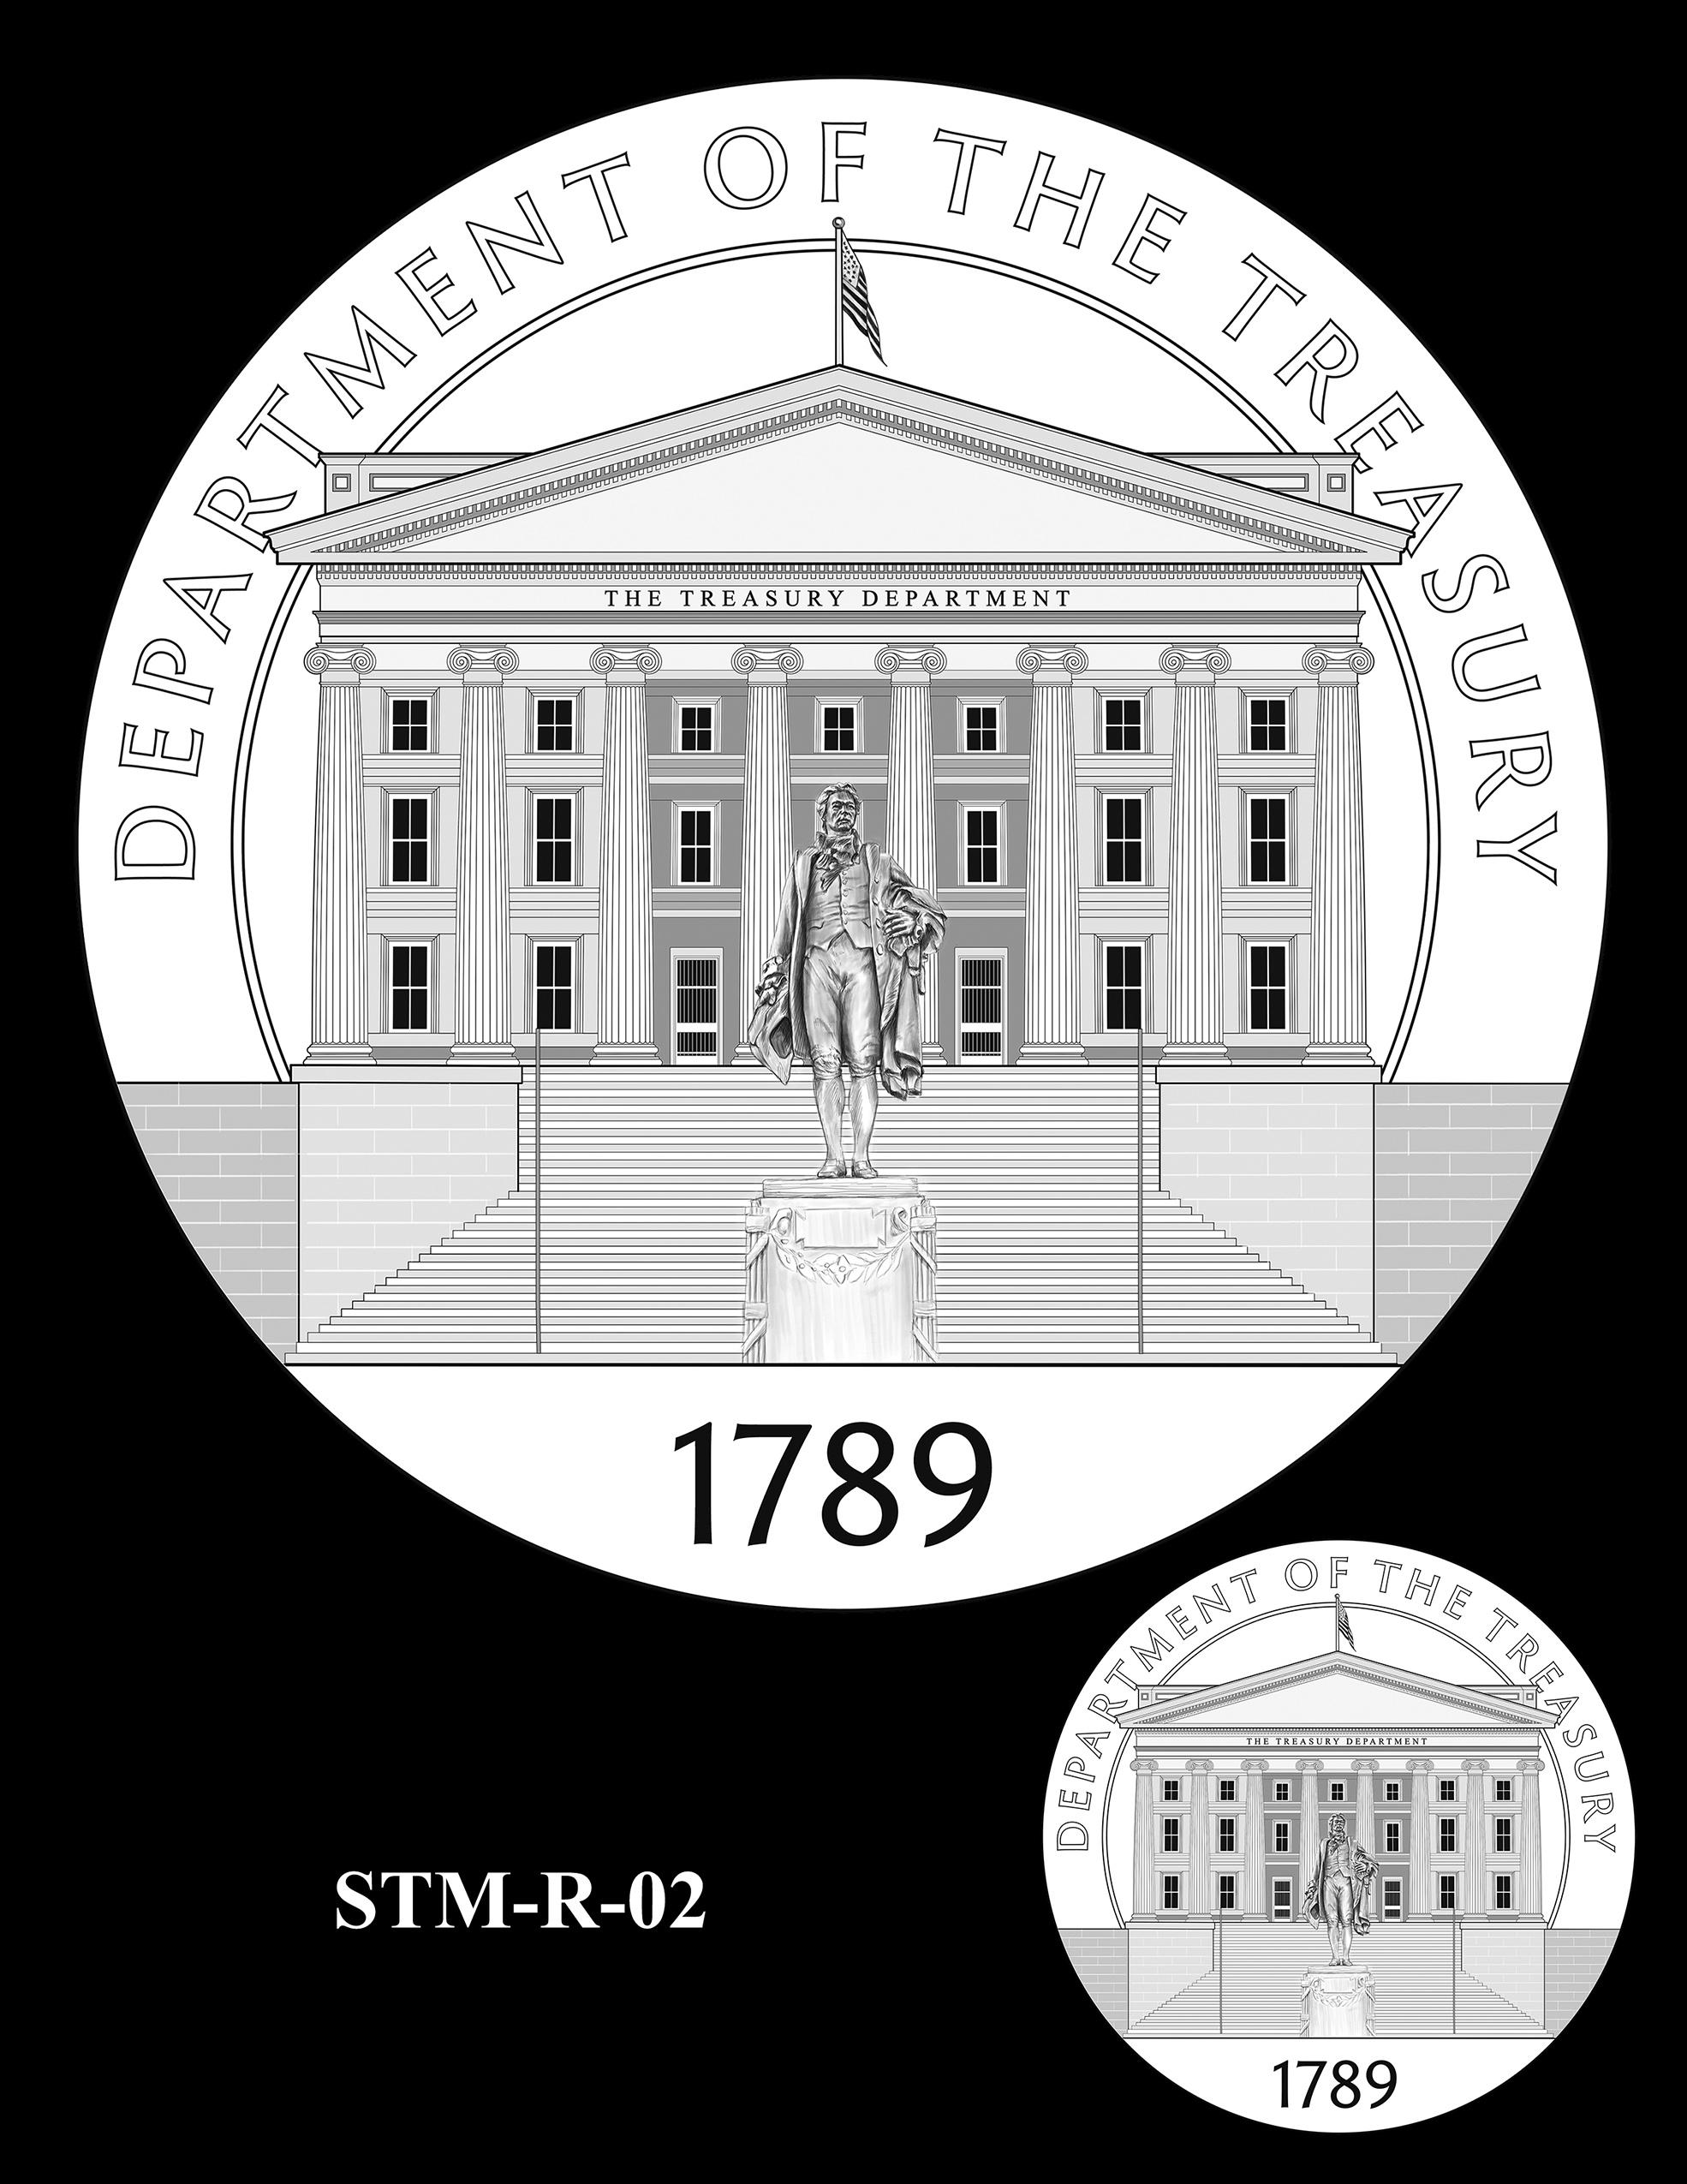 STM-R-02 -- Steven T. Mnuchin Secretary of the Treasury Medal